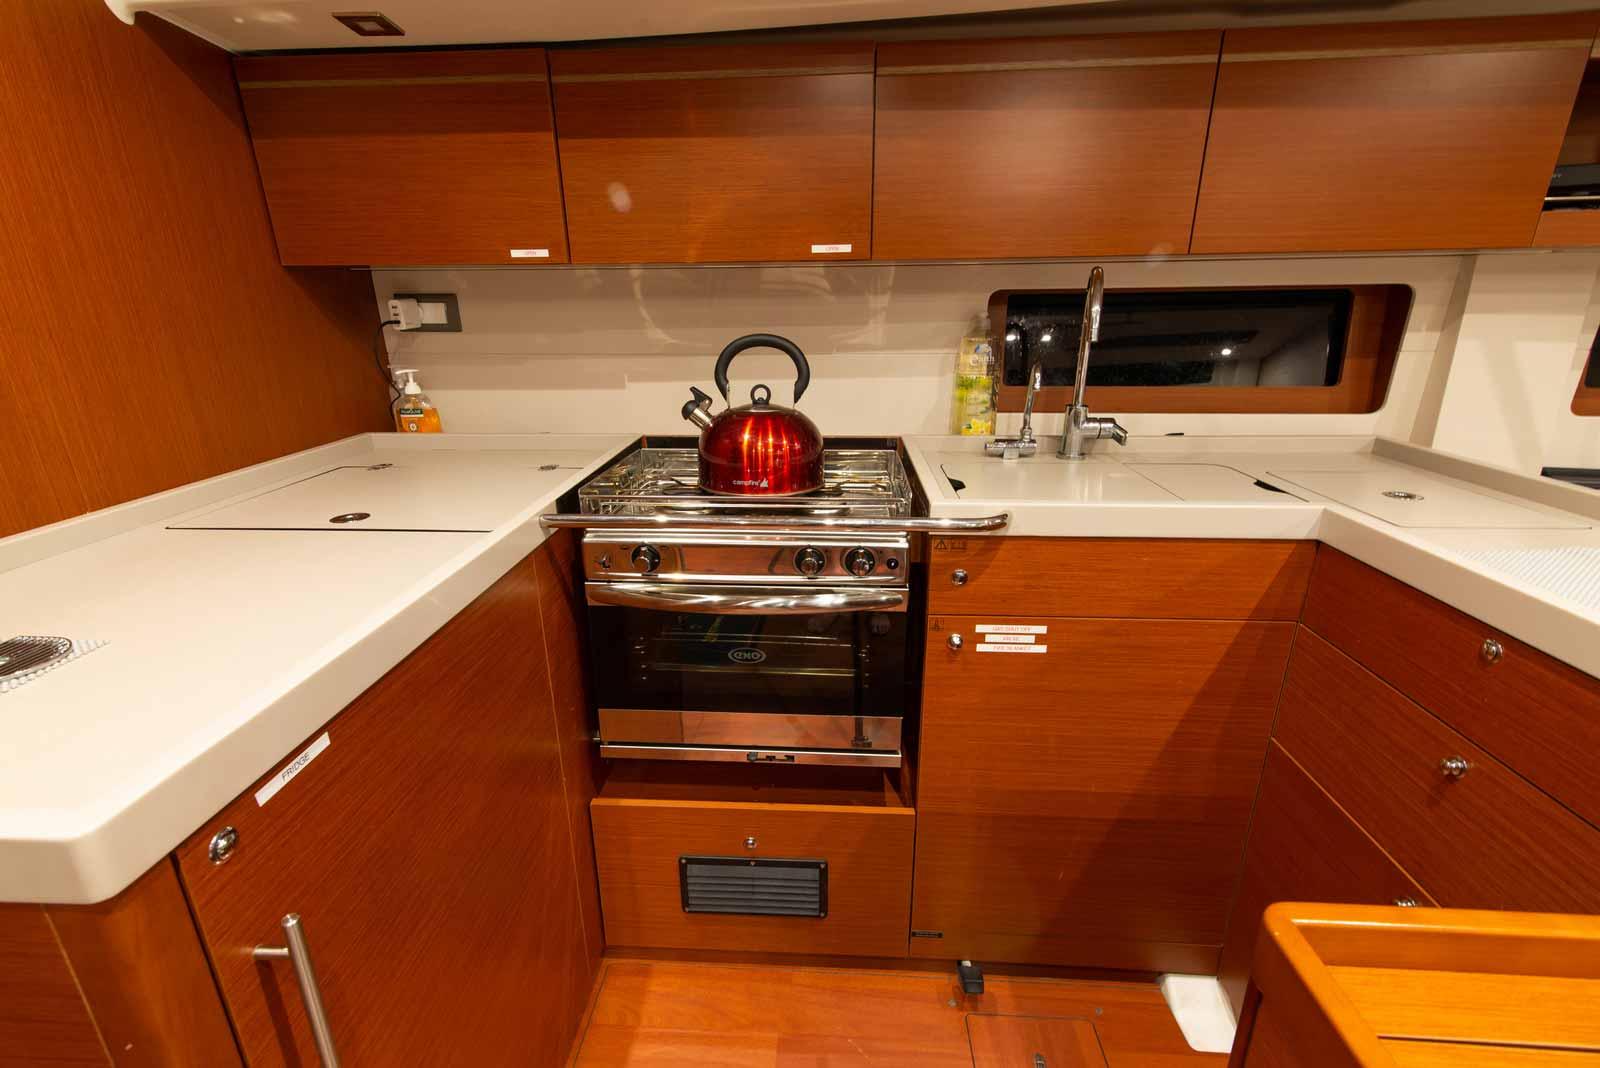 Beneteau-51.1-Interior-Kitchen